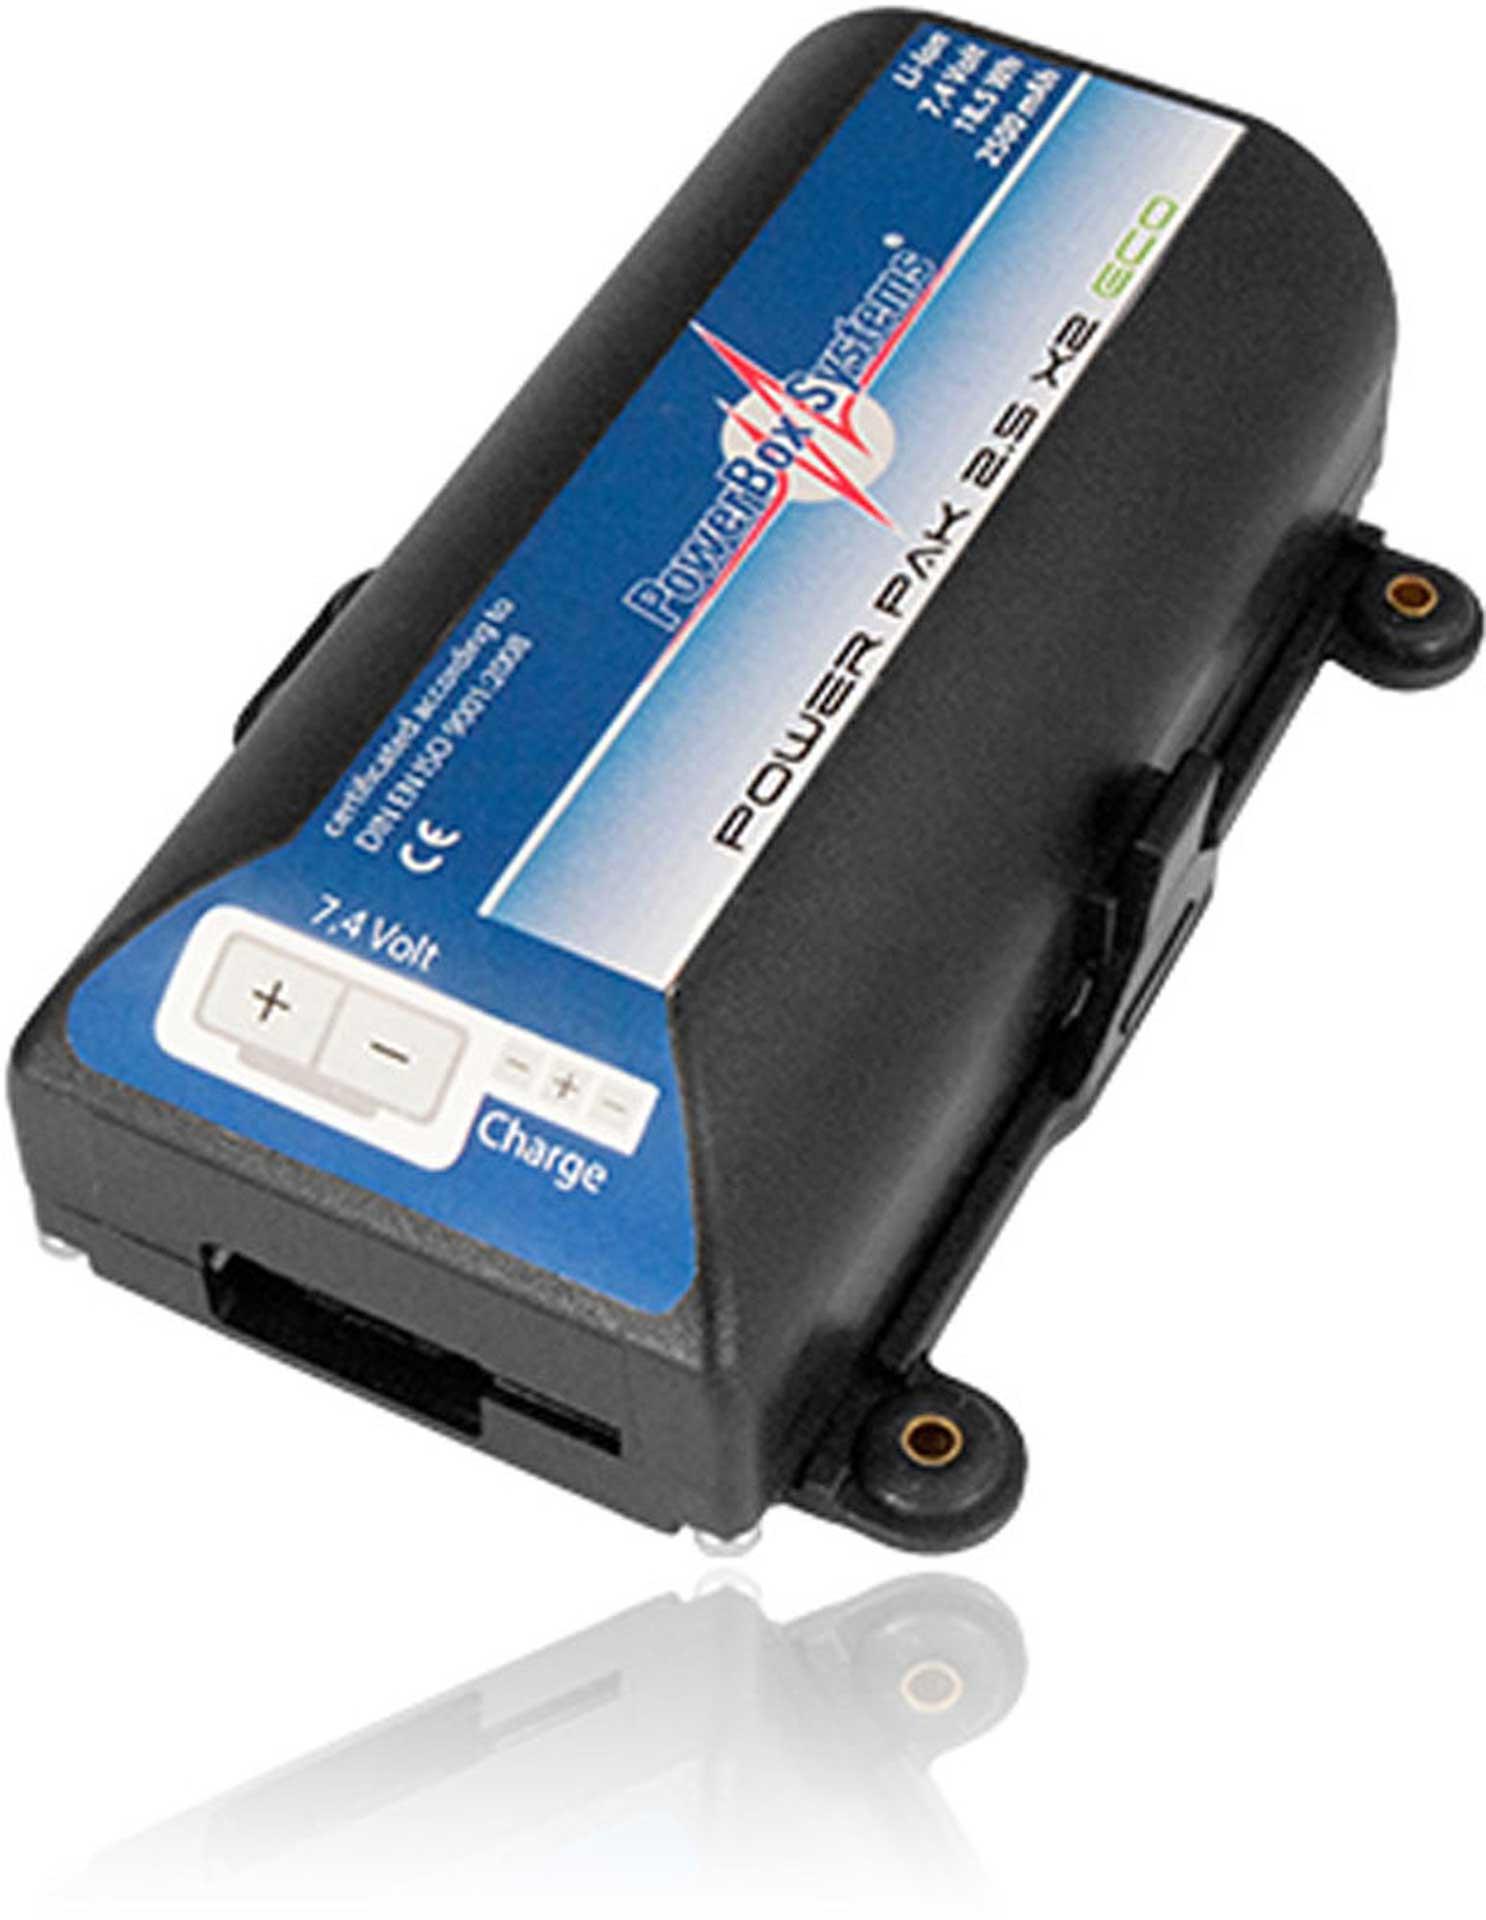 POWERBOX SYSTEMS POWERPAK 2.5X2 ECO 2500MAH 7.4V